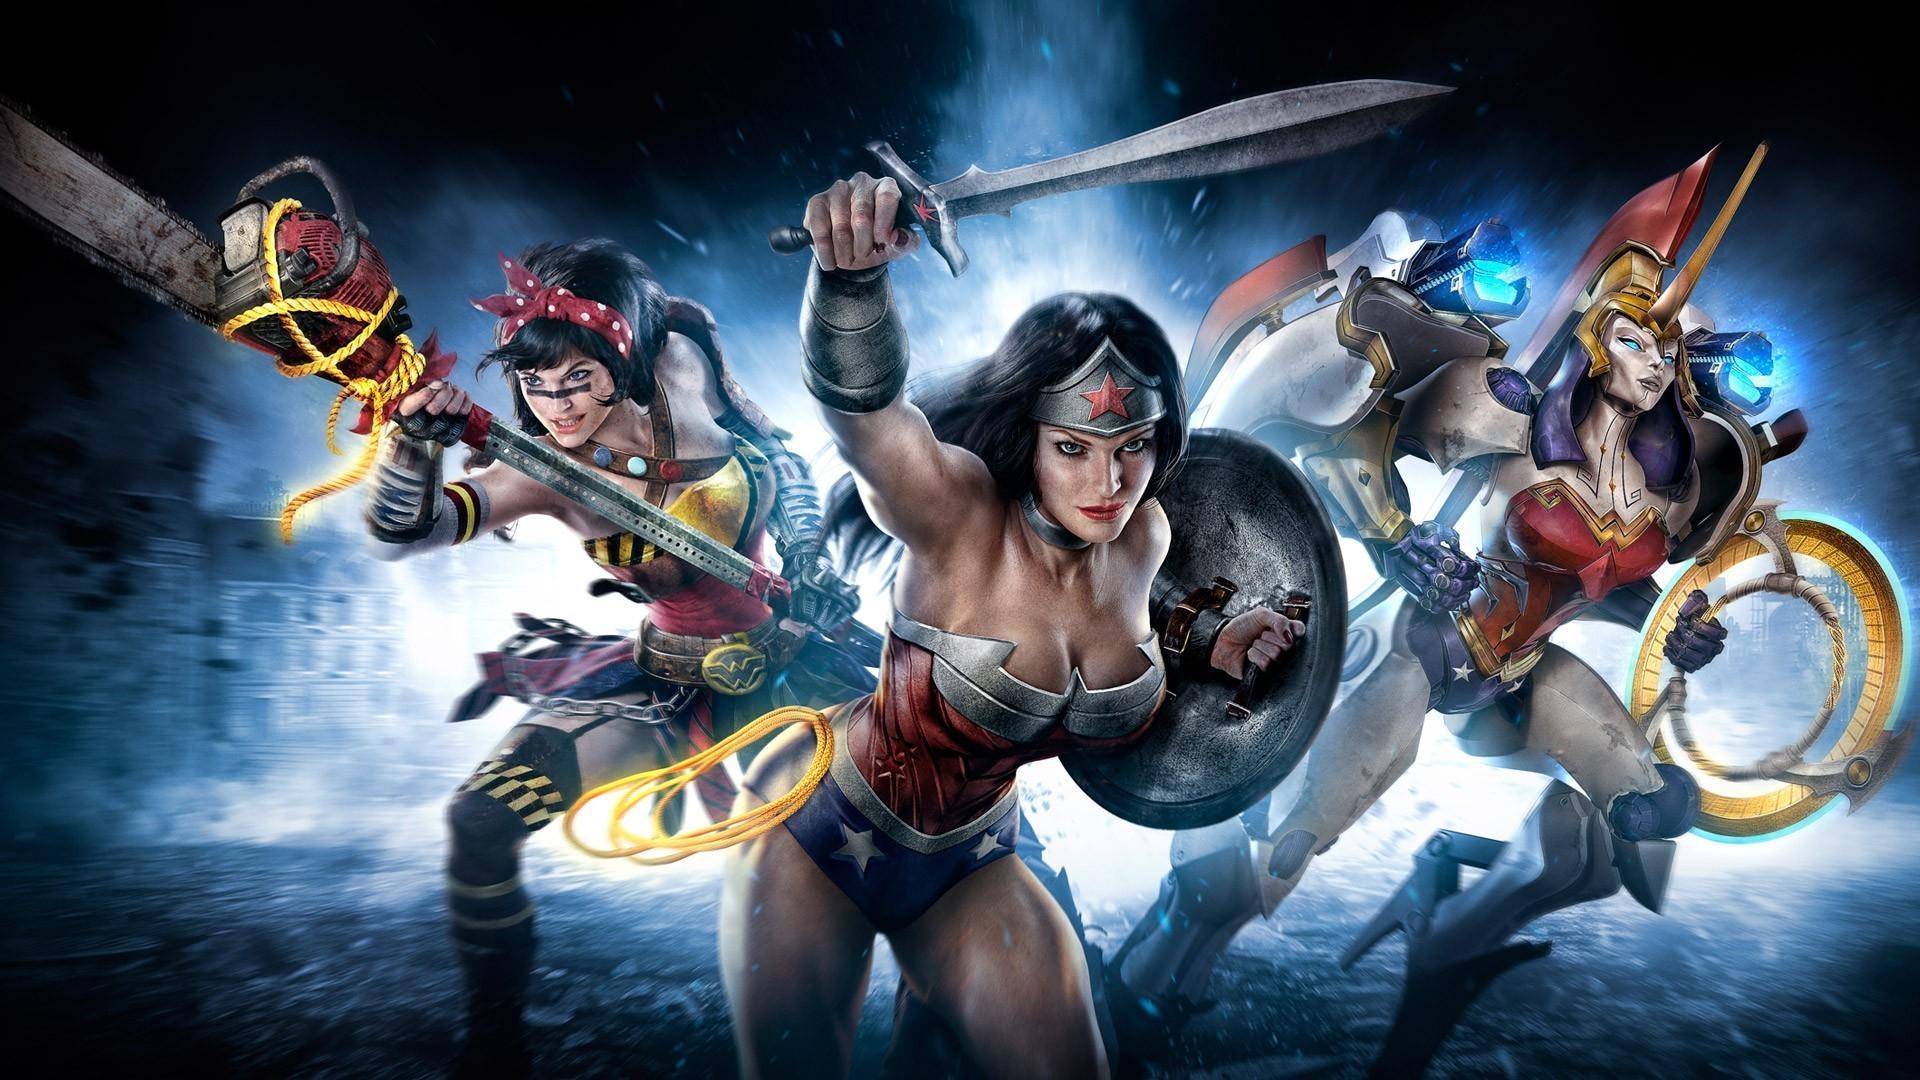 comic superheroes women   superhero Wonder Woman DC-comics Sword wallpaper  background